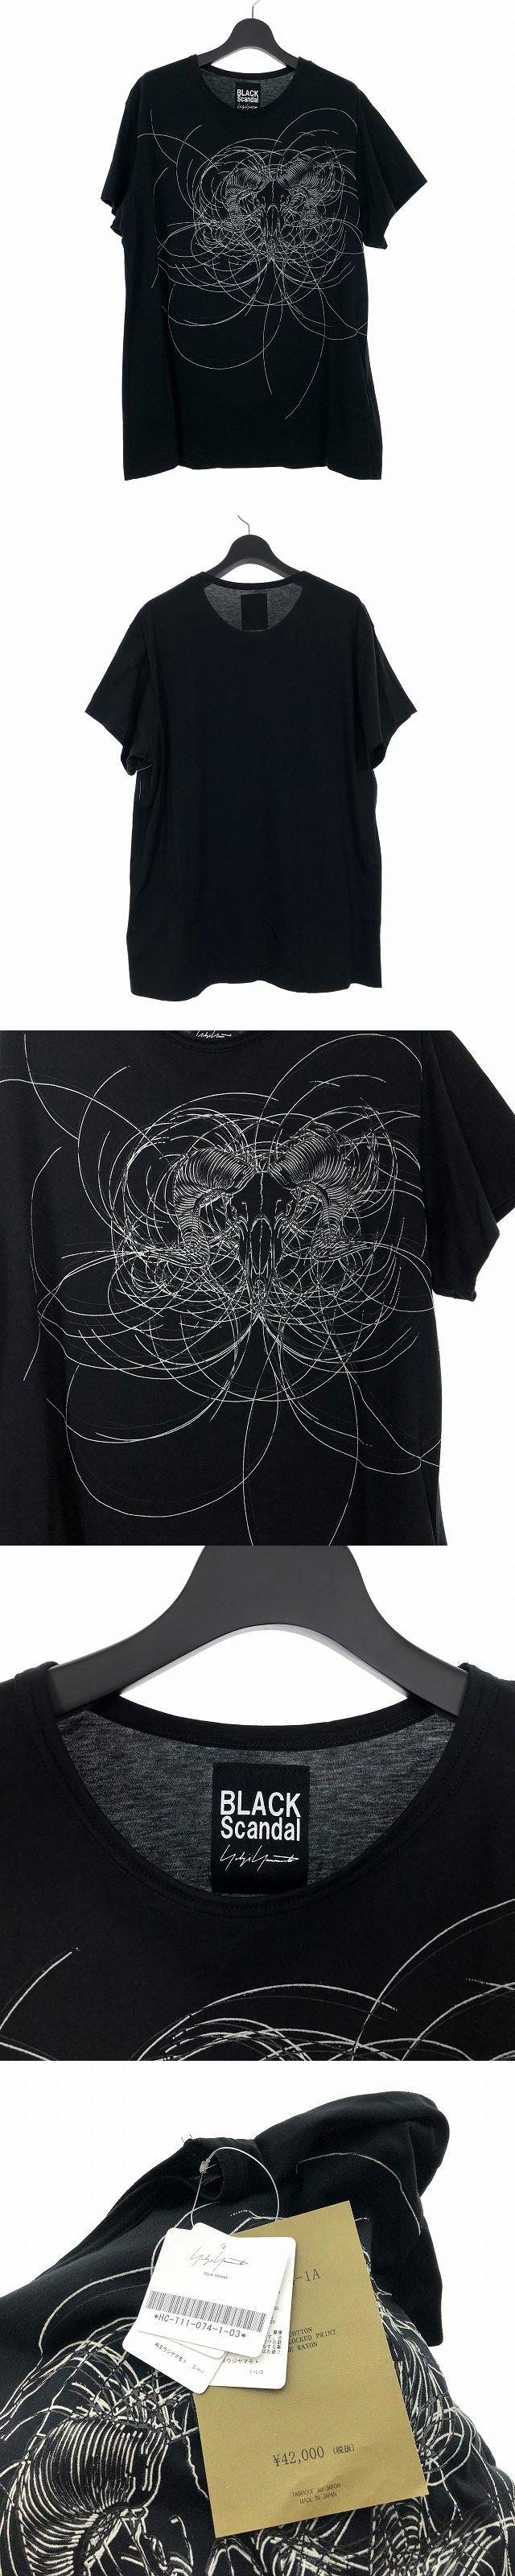 BLACK Scandal 19AW 丸首半バッファロー柄 プリント Tシャツ カットソー 半袖 3 ブラック 黒 HC-T11-074